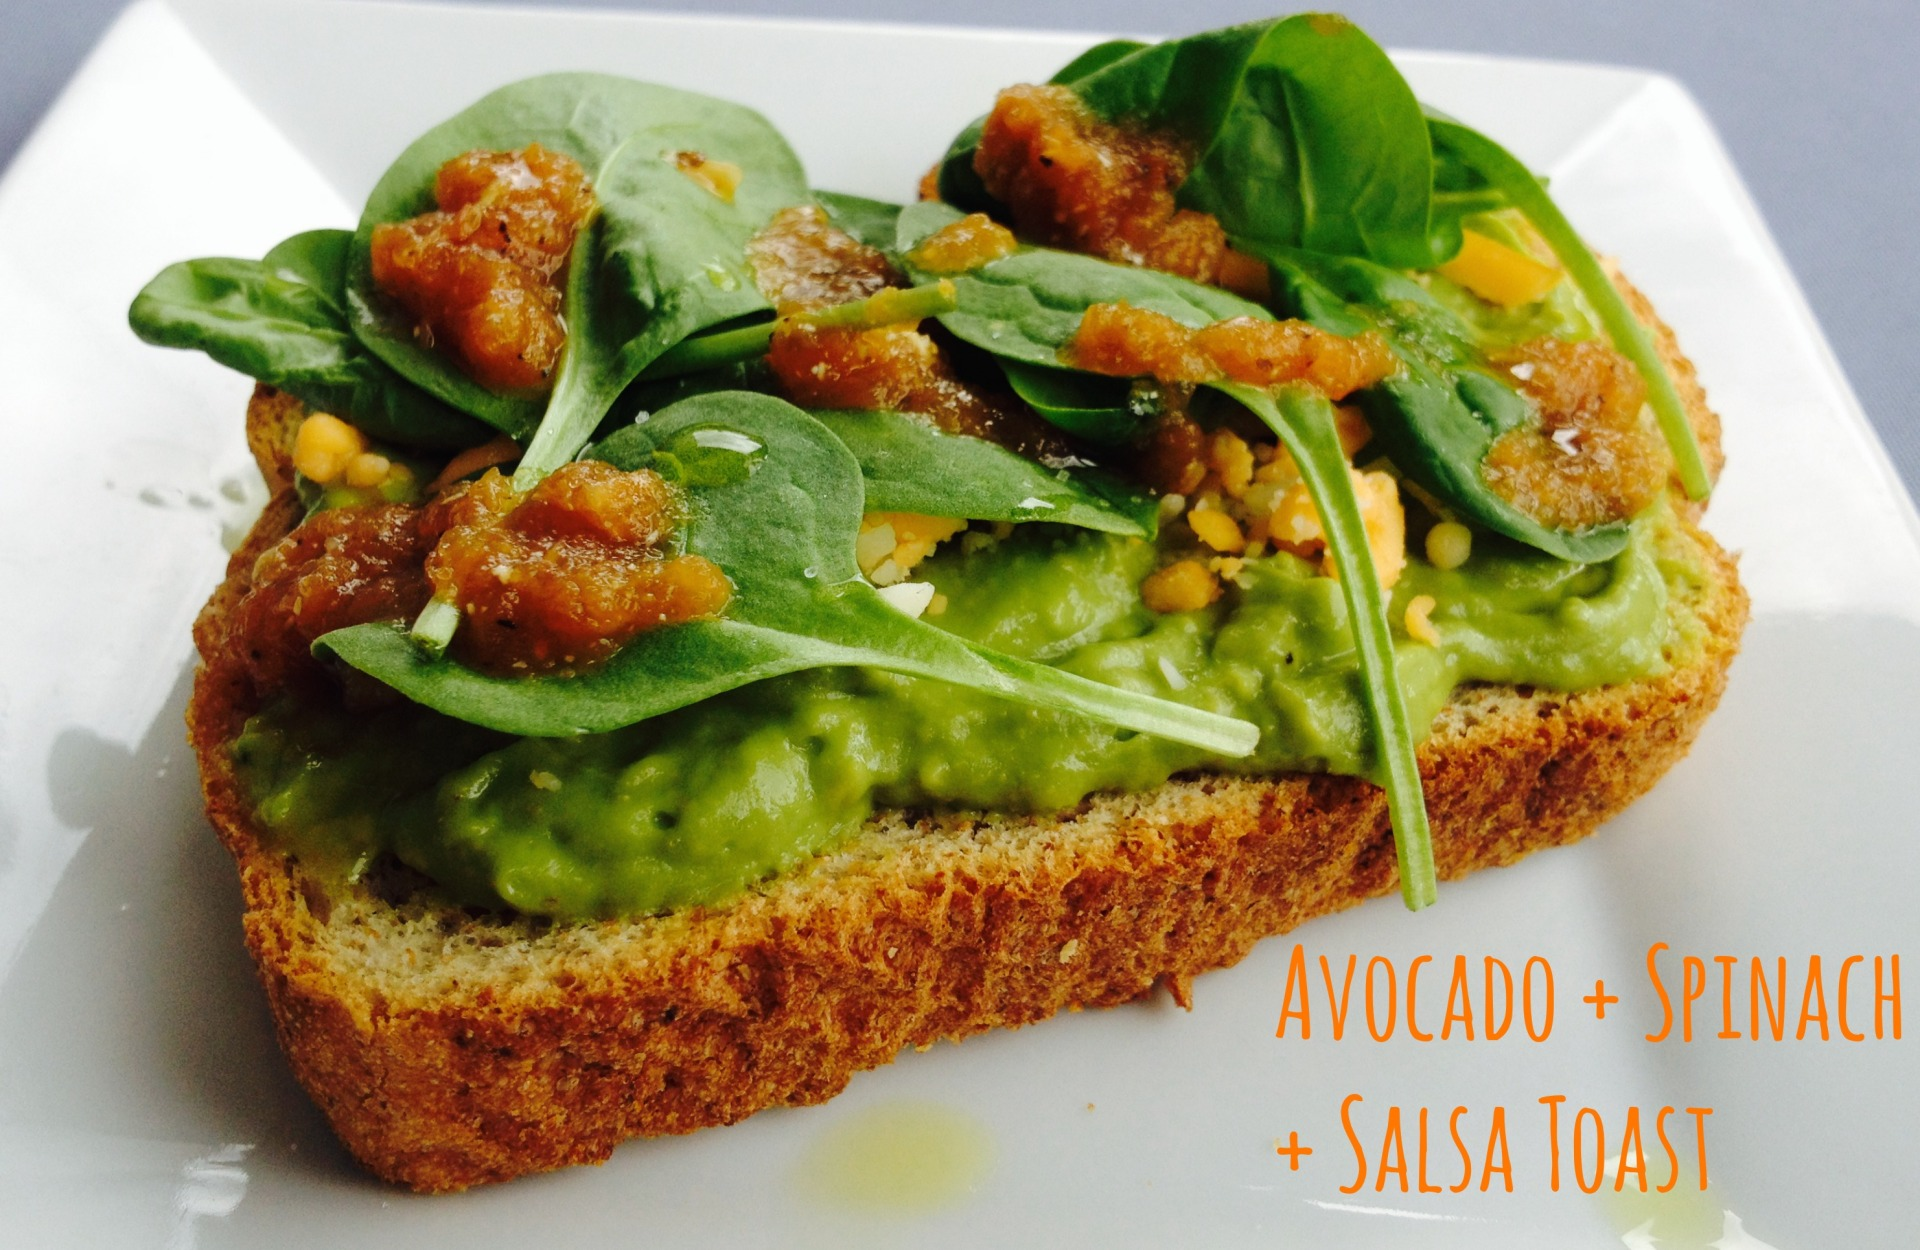 Avocado-spinach-Salsa-Toast